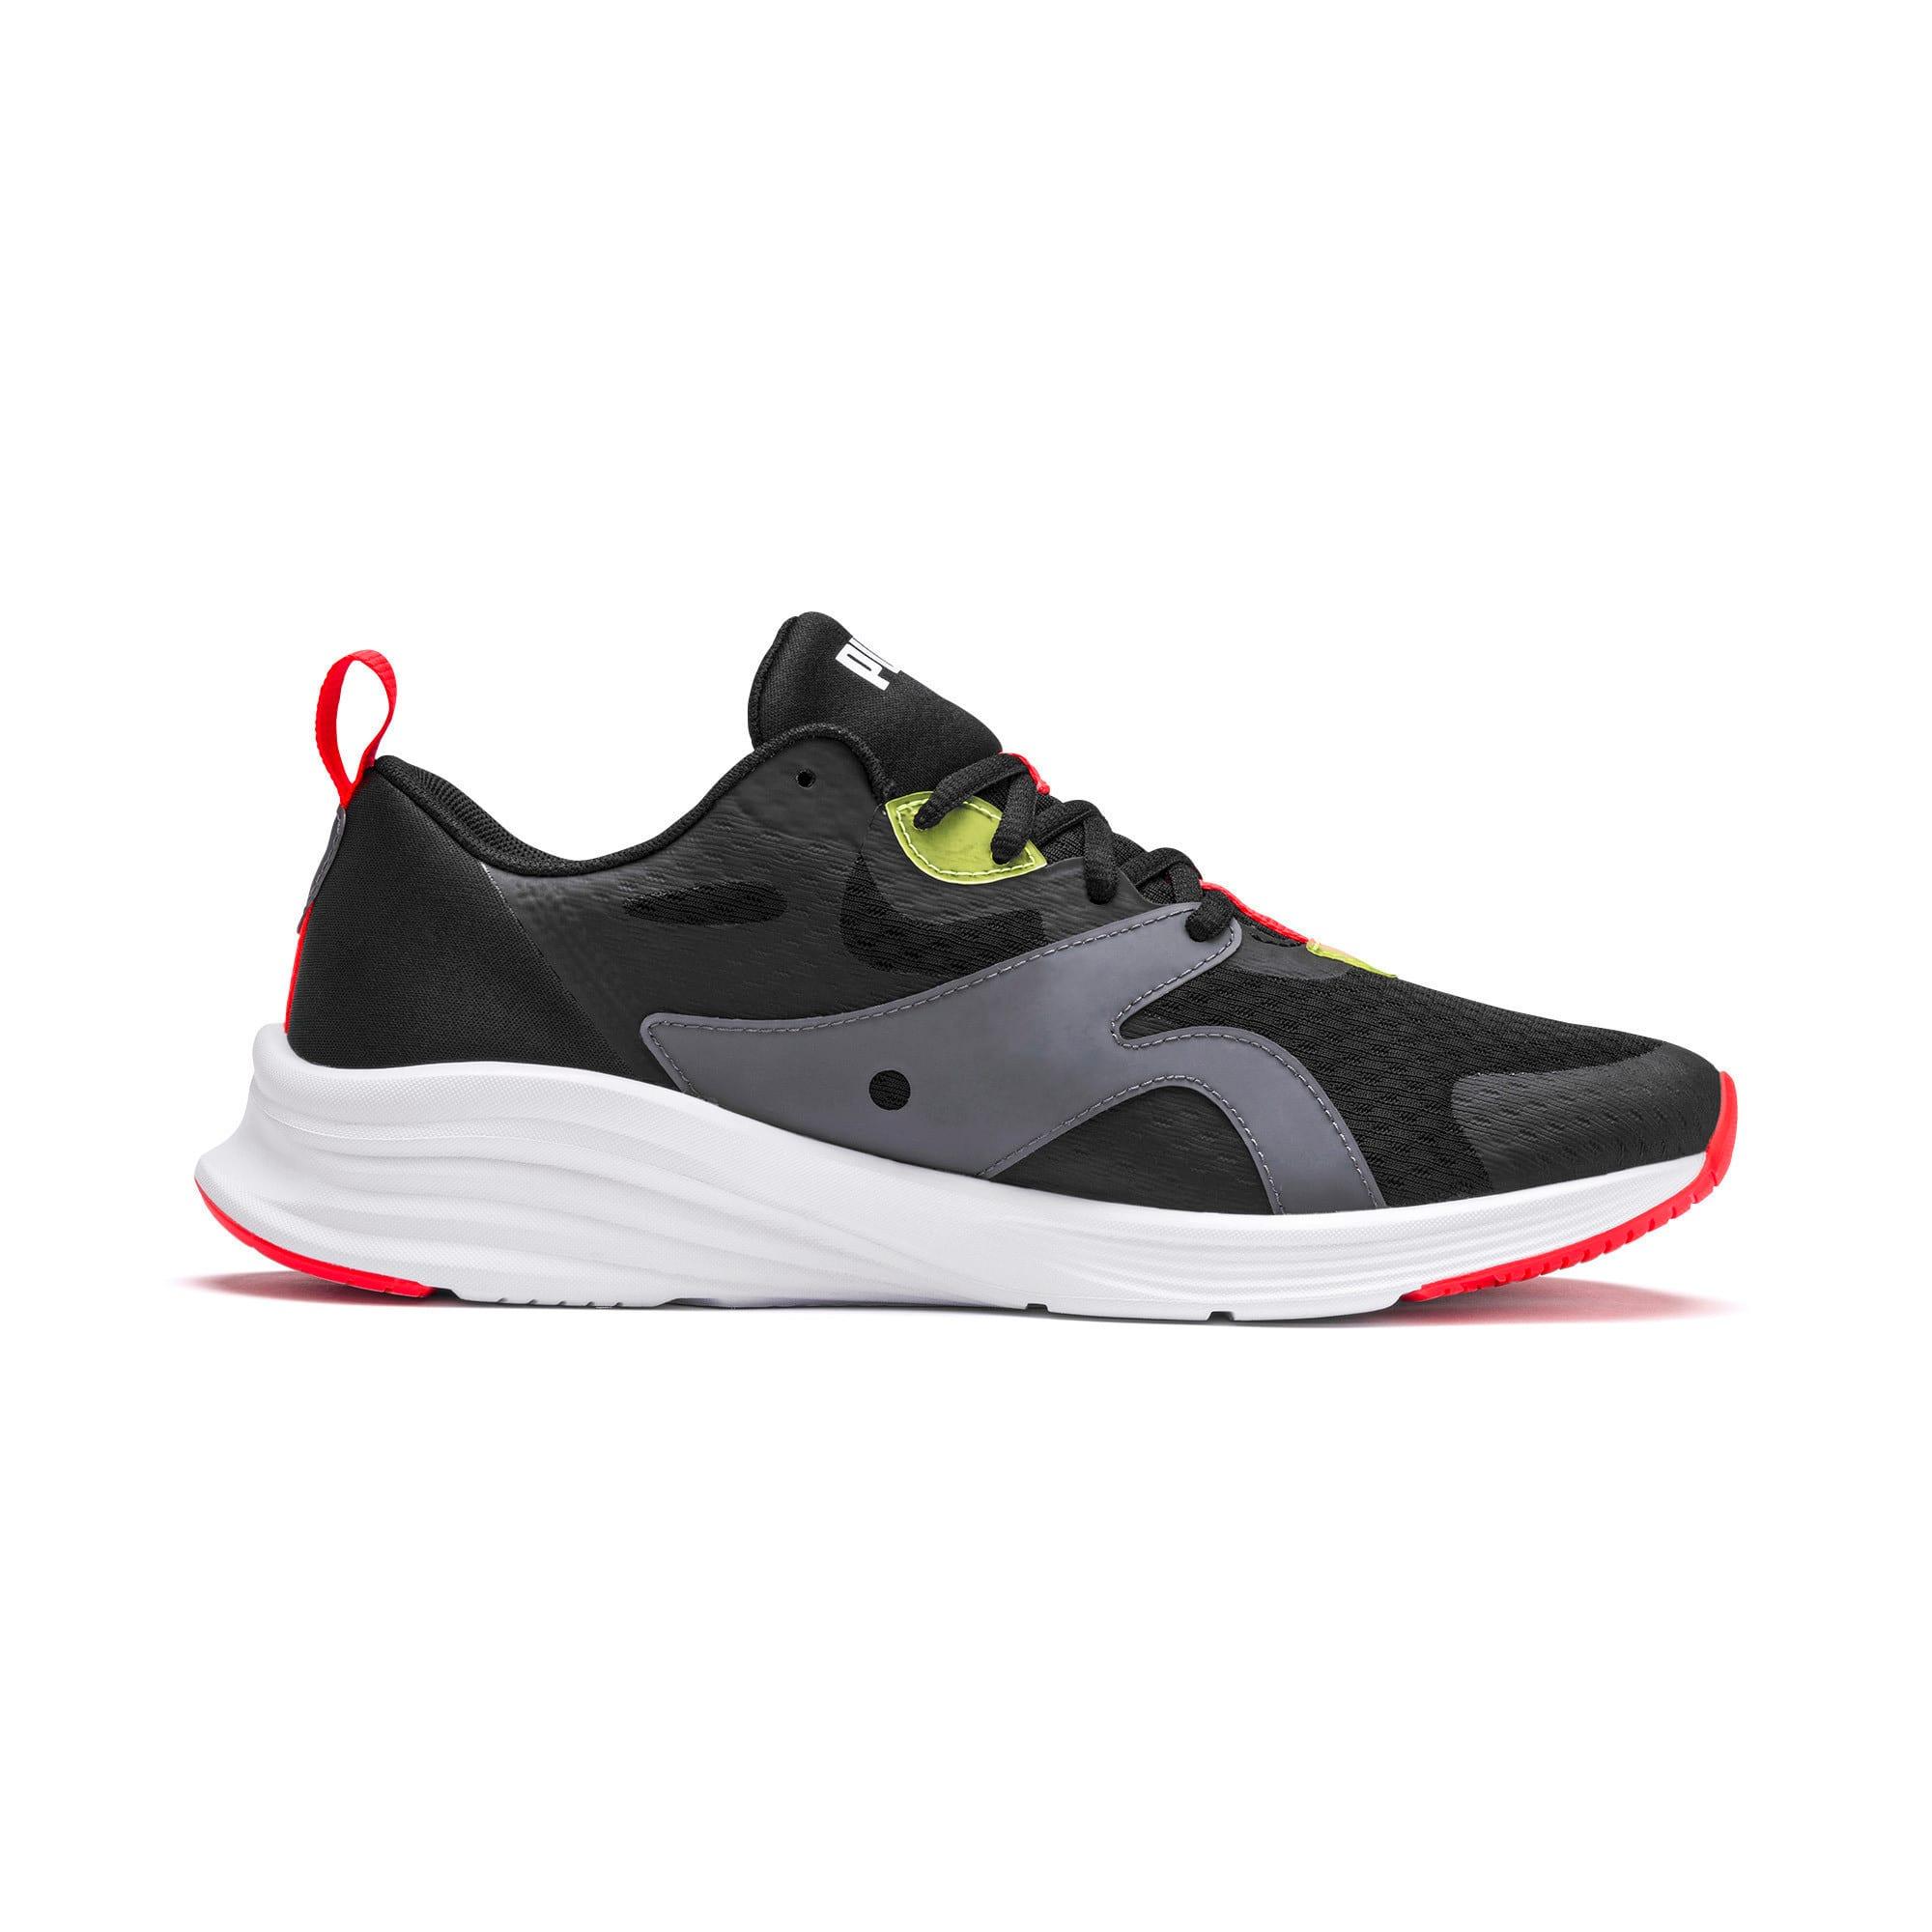 Thumbnail 3 of HYBRID Fuego Men's Running Shoes, Puma Black-Yellow Alert, medium-IND